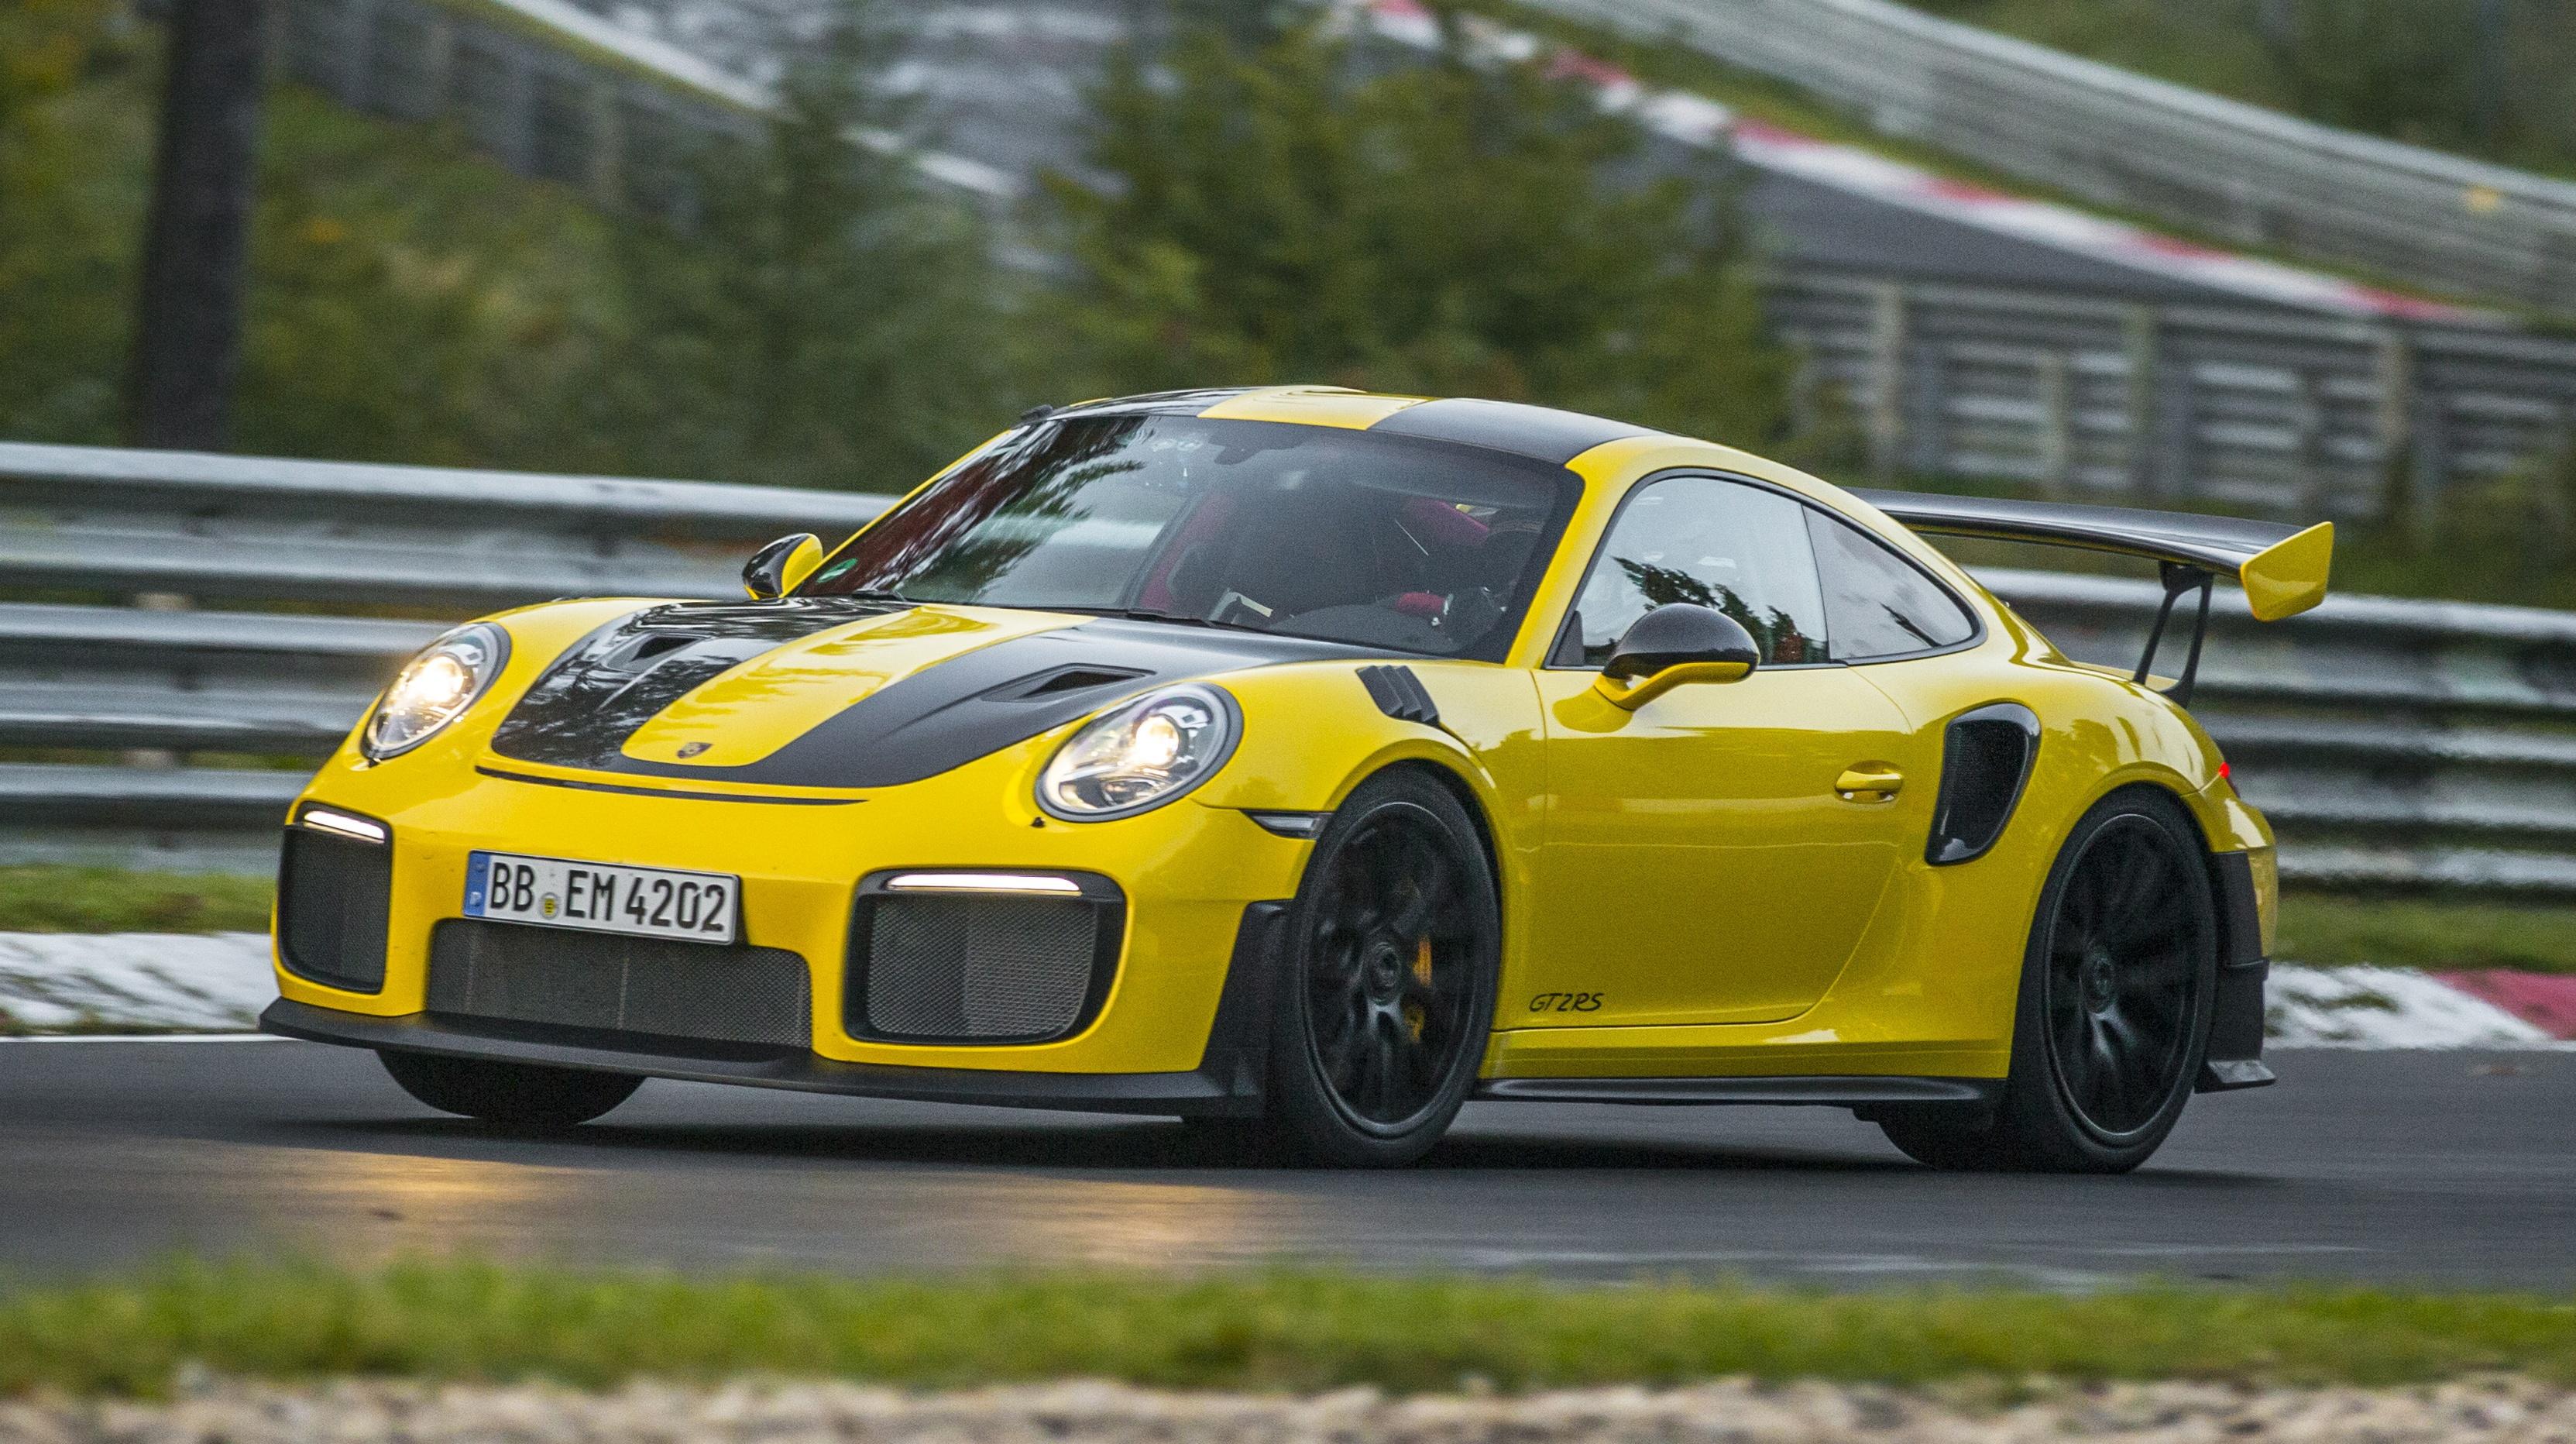 Porsche-991-GT3-RS-Ring-record-2-e1506511393829 Astounding Porsche 911 Gt2 Rs 2012 Cars Trend